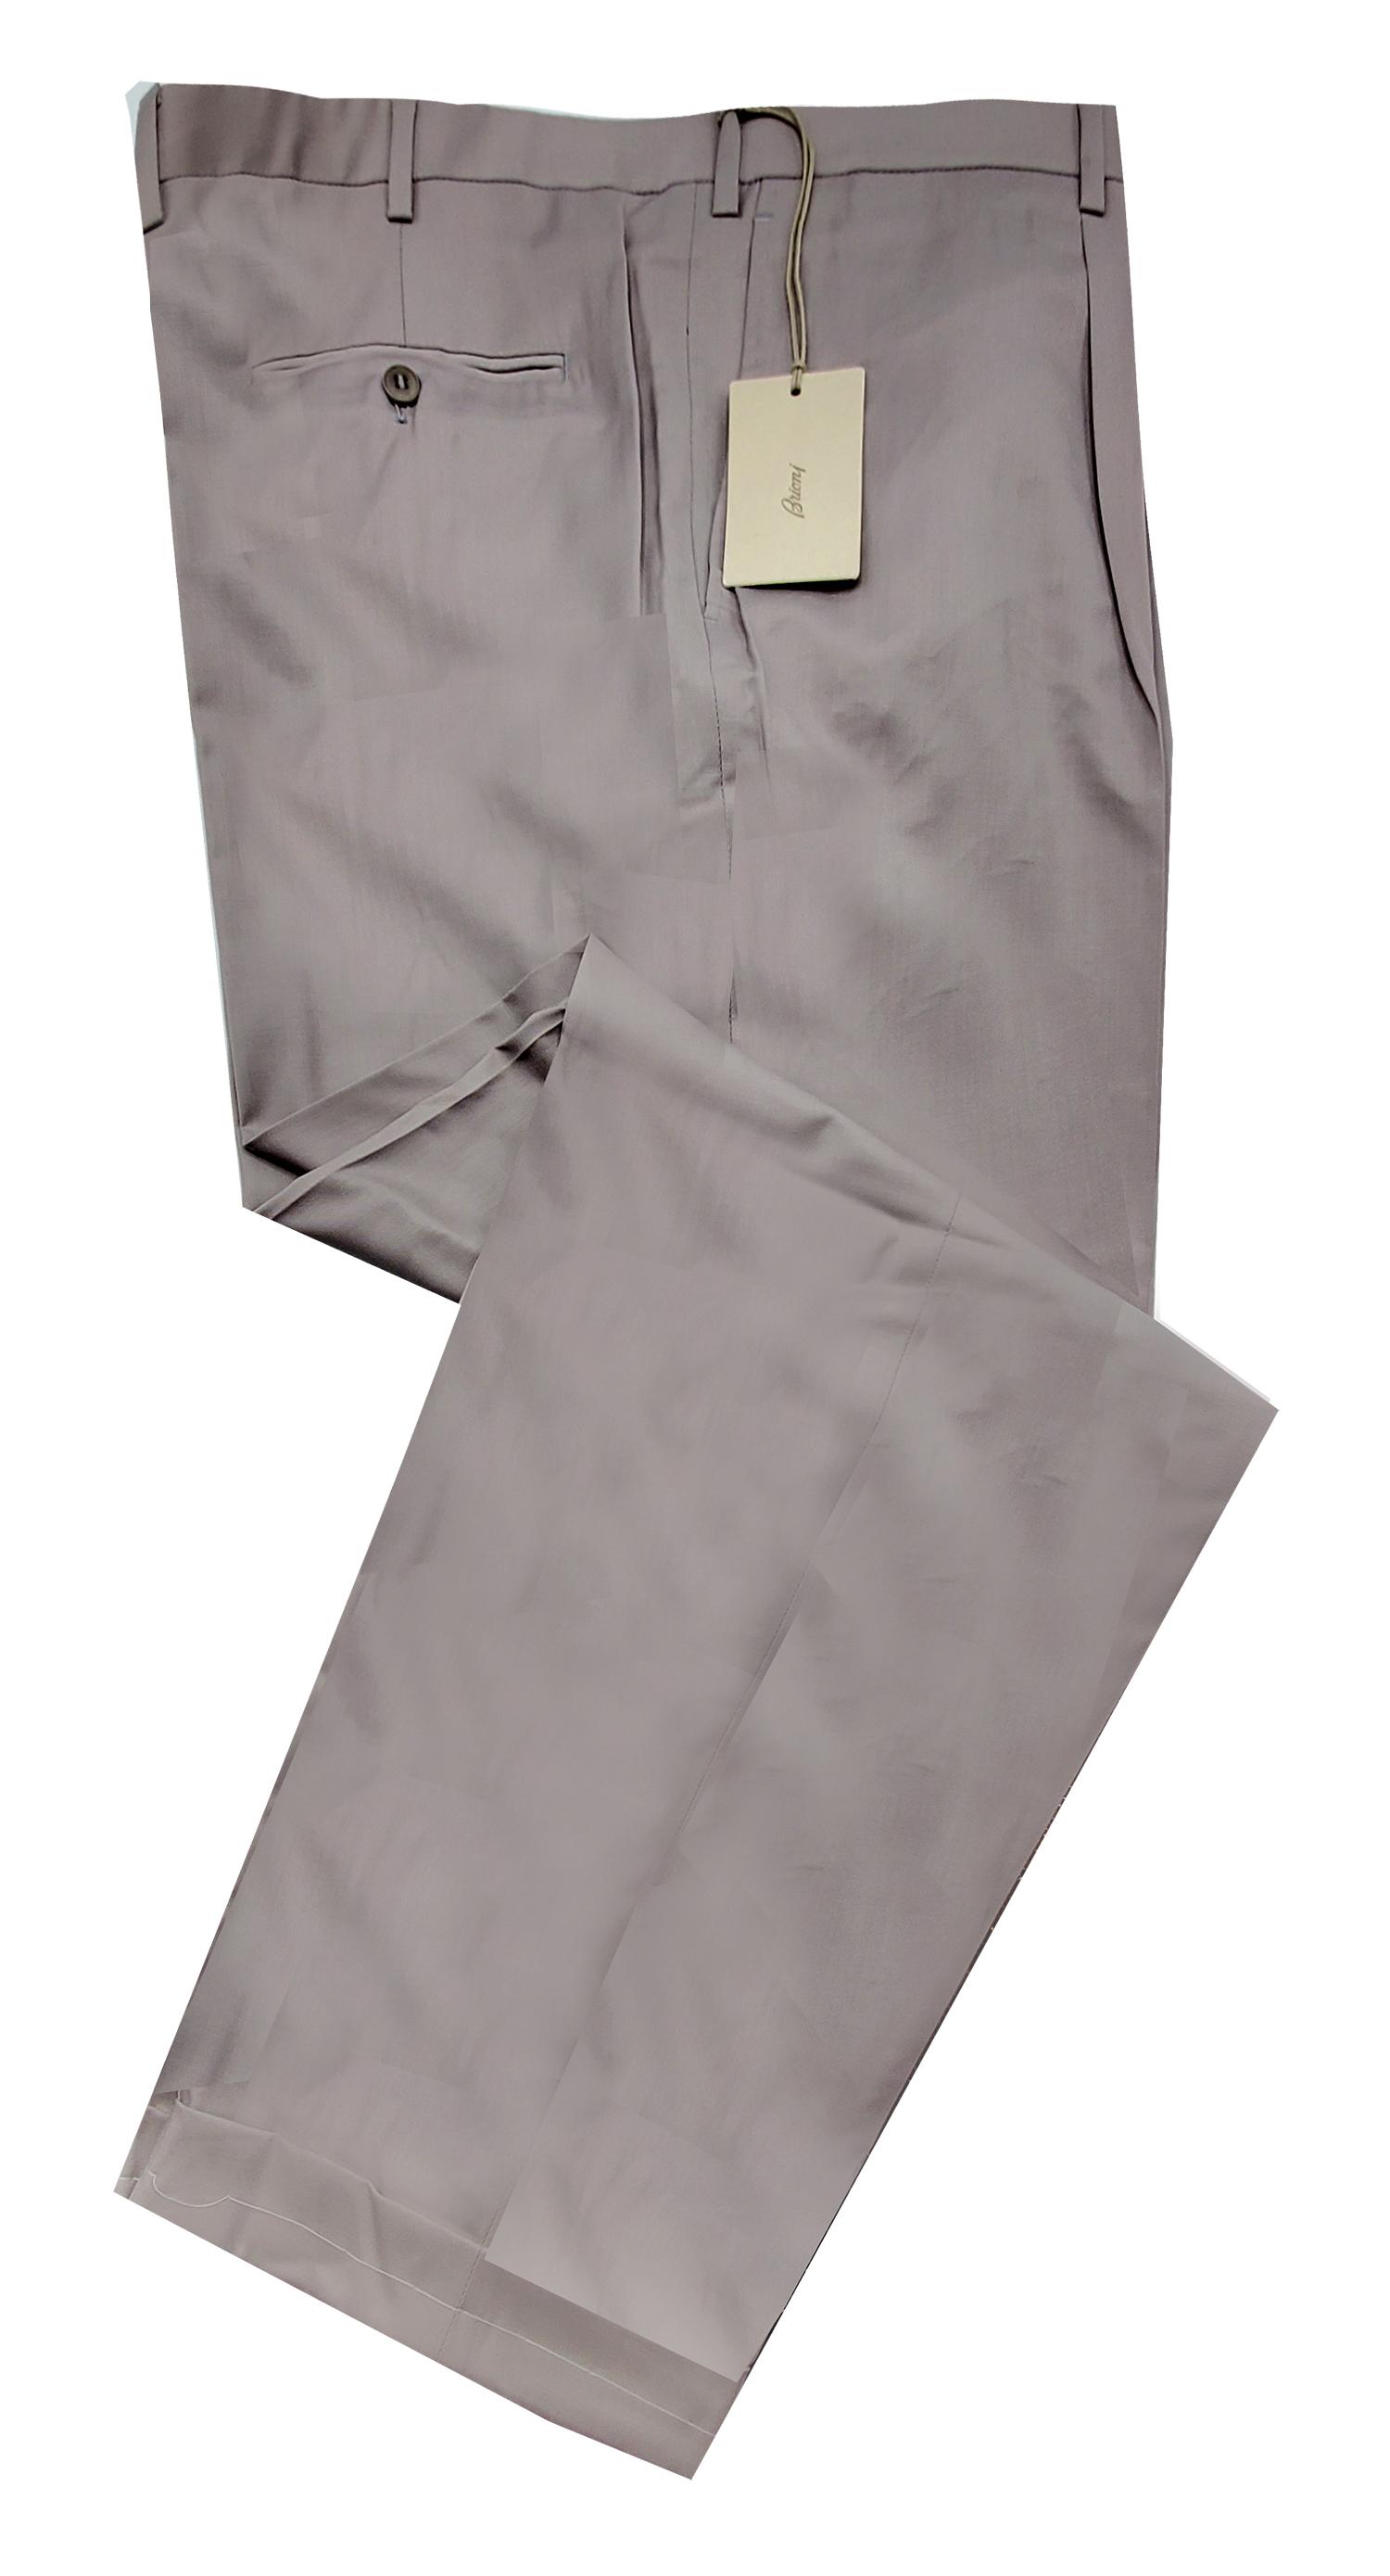 f939dbedab1df4 Brioni Men's Cortina All Season Light Gray Wool Pants | eBay